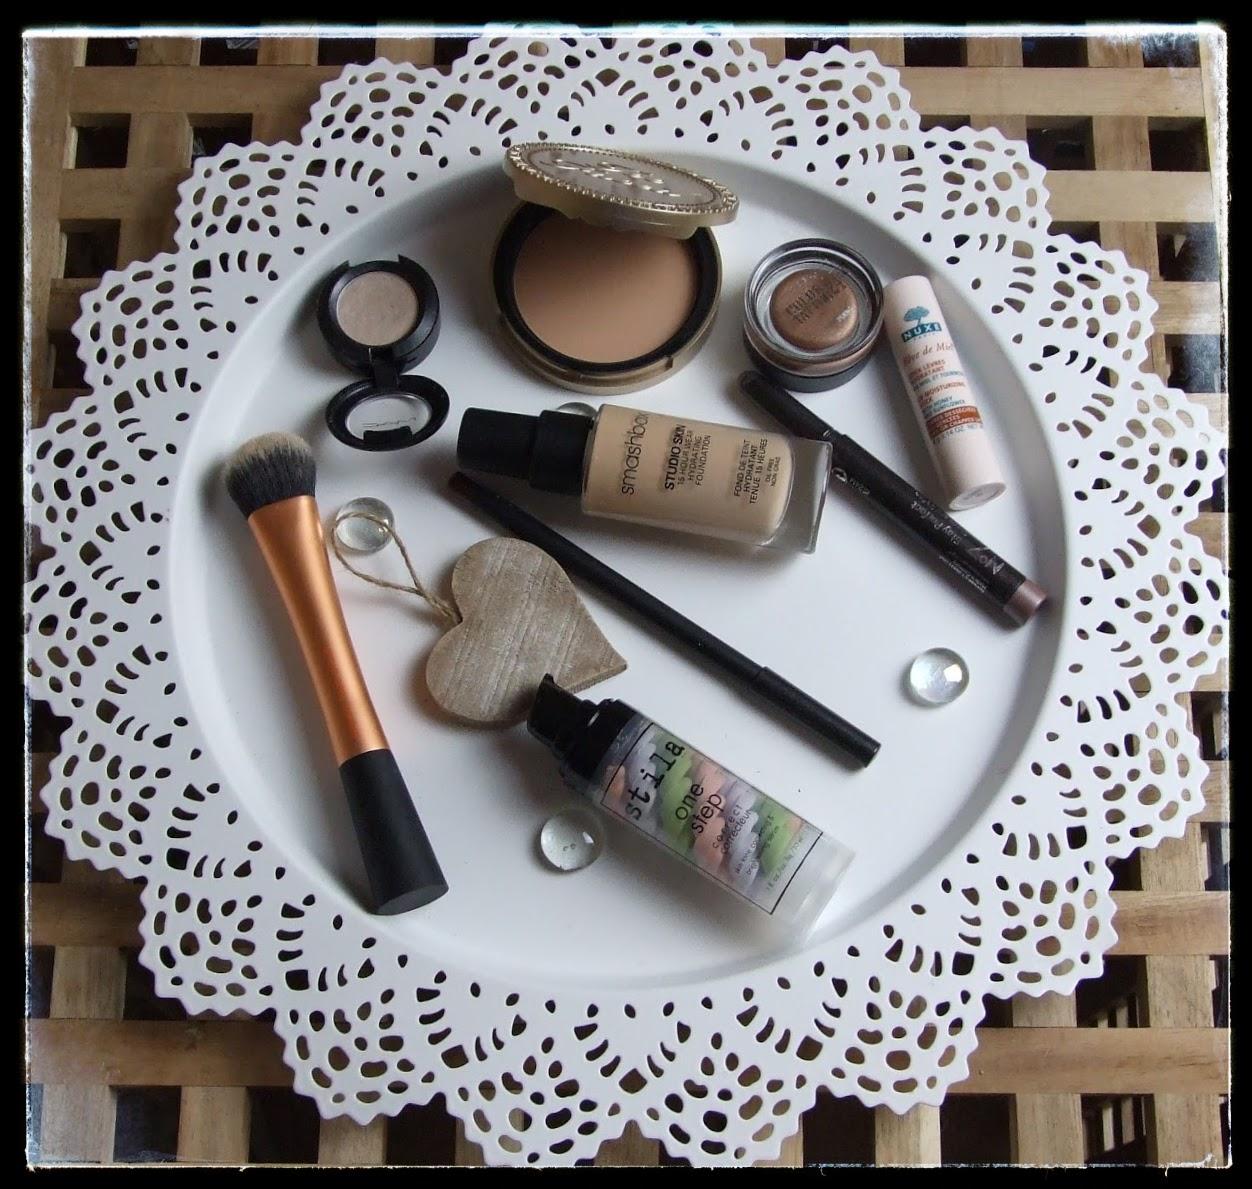 acesparklestar january favourites 2015 round-up #bblogger beauty blog